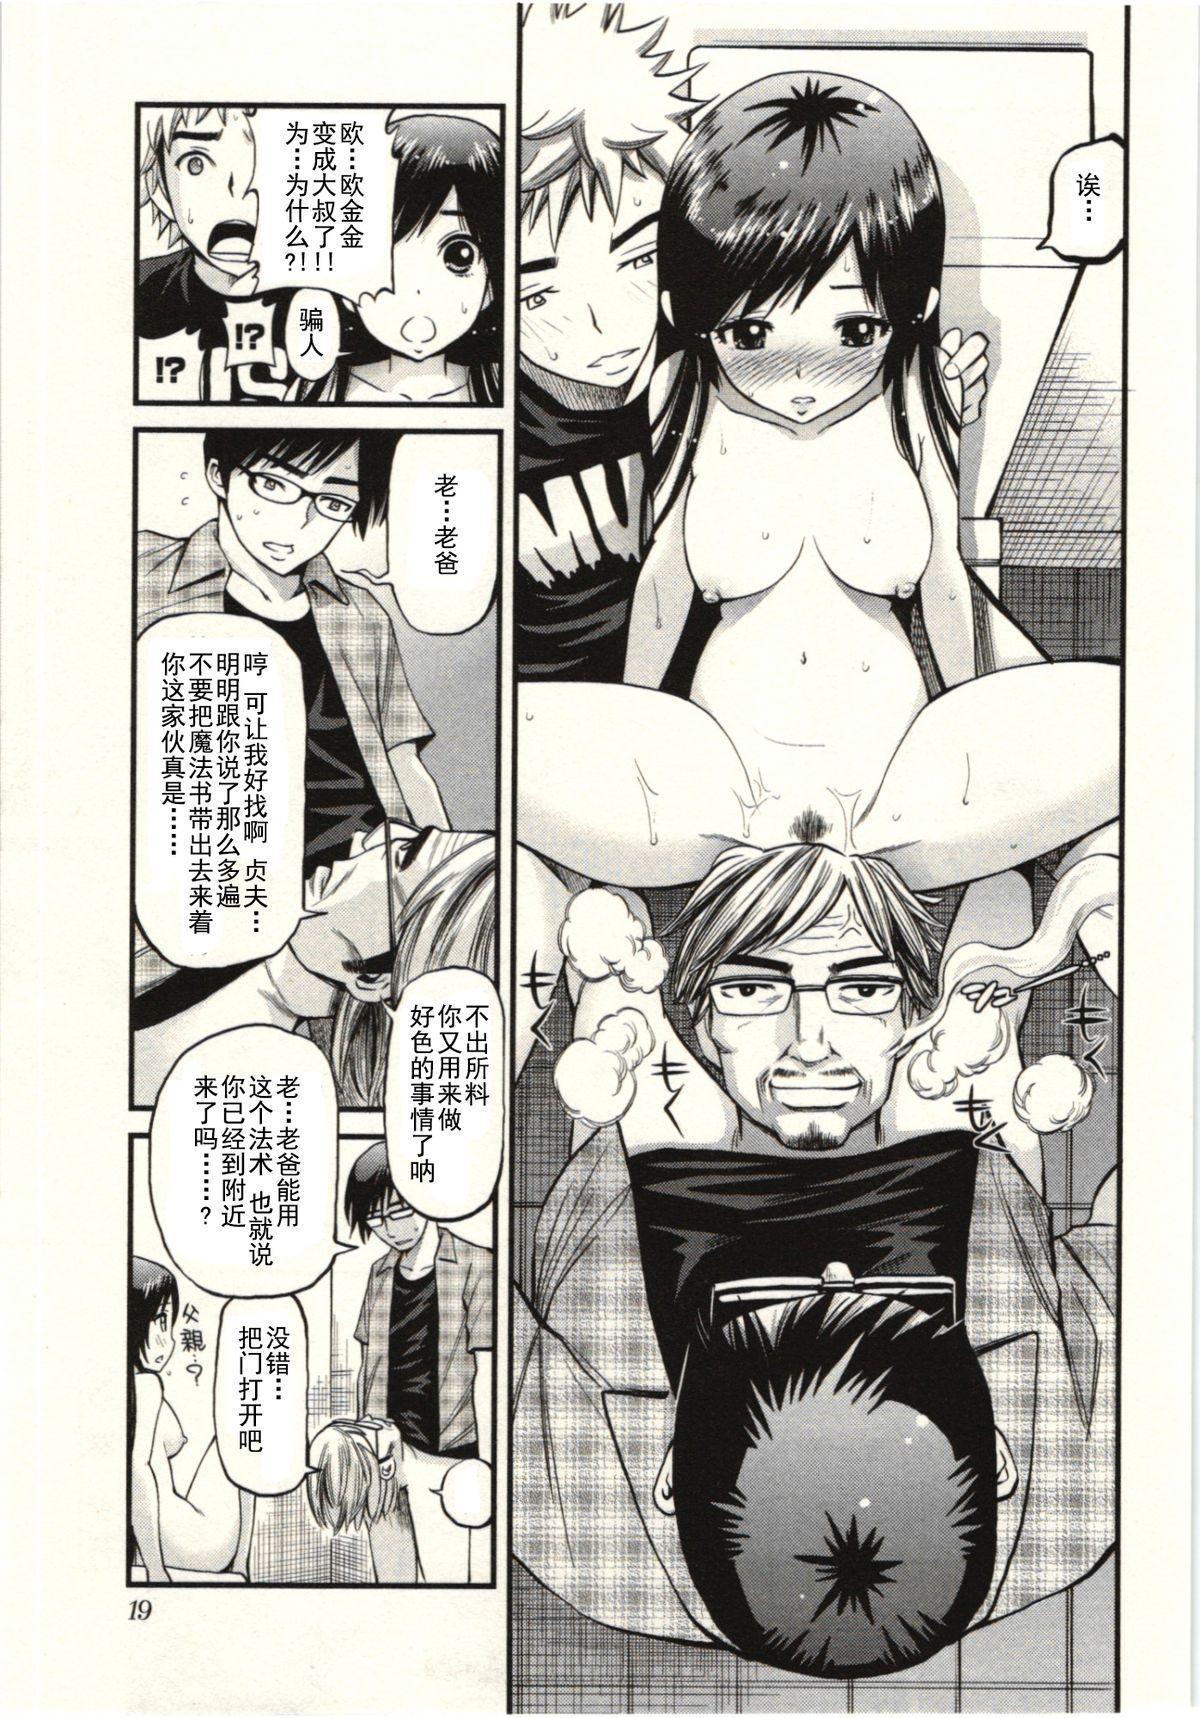 Tadashii Majutsu no Asobikata - The right way of playing of magic. 21